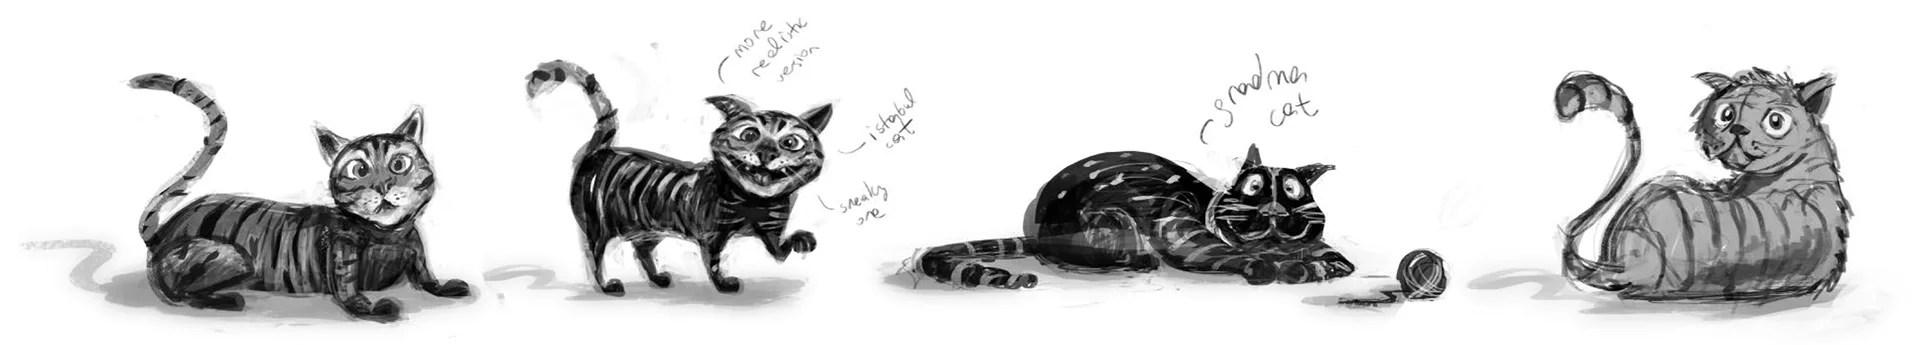 cute cat dog illustration